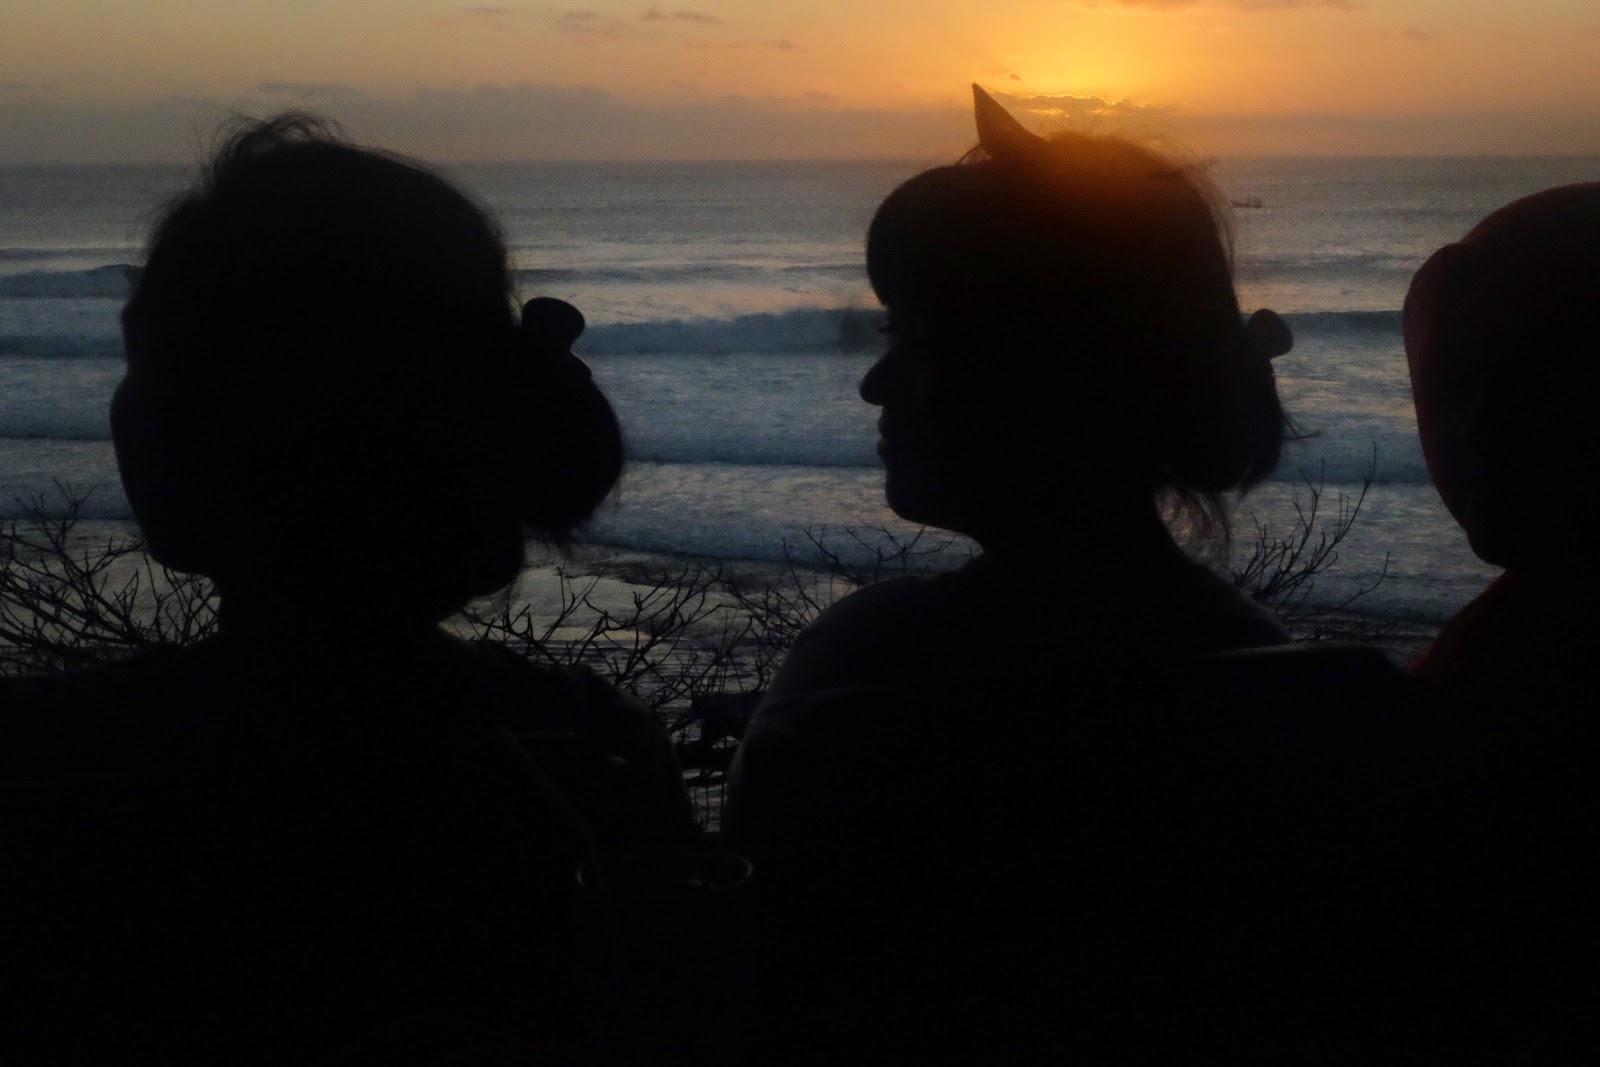 sunset in bluepoint beach